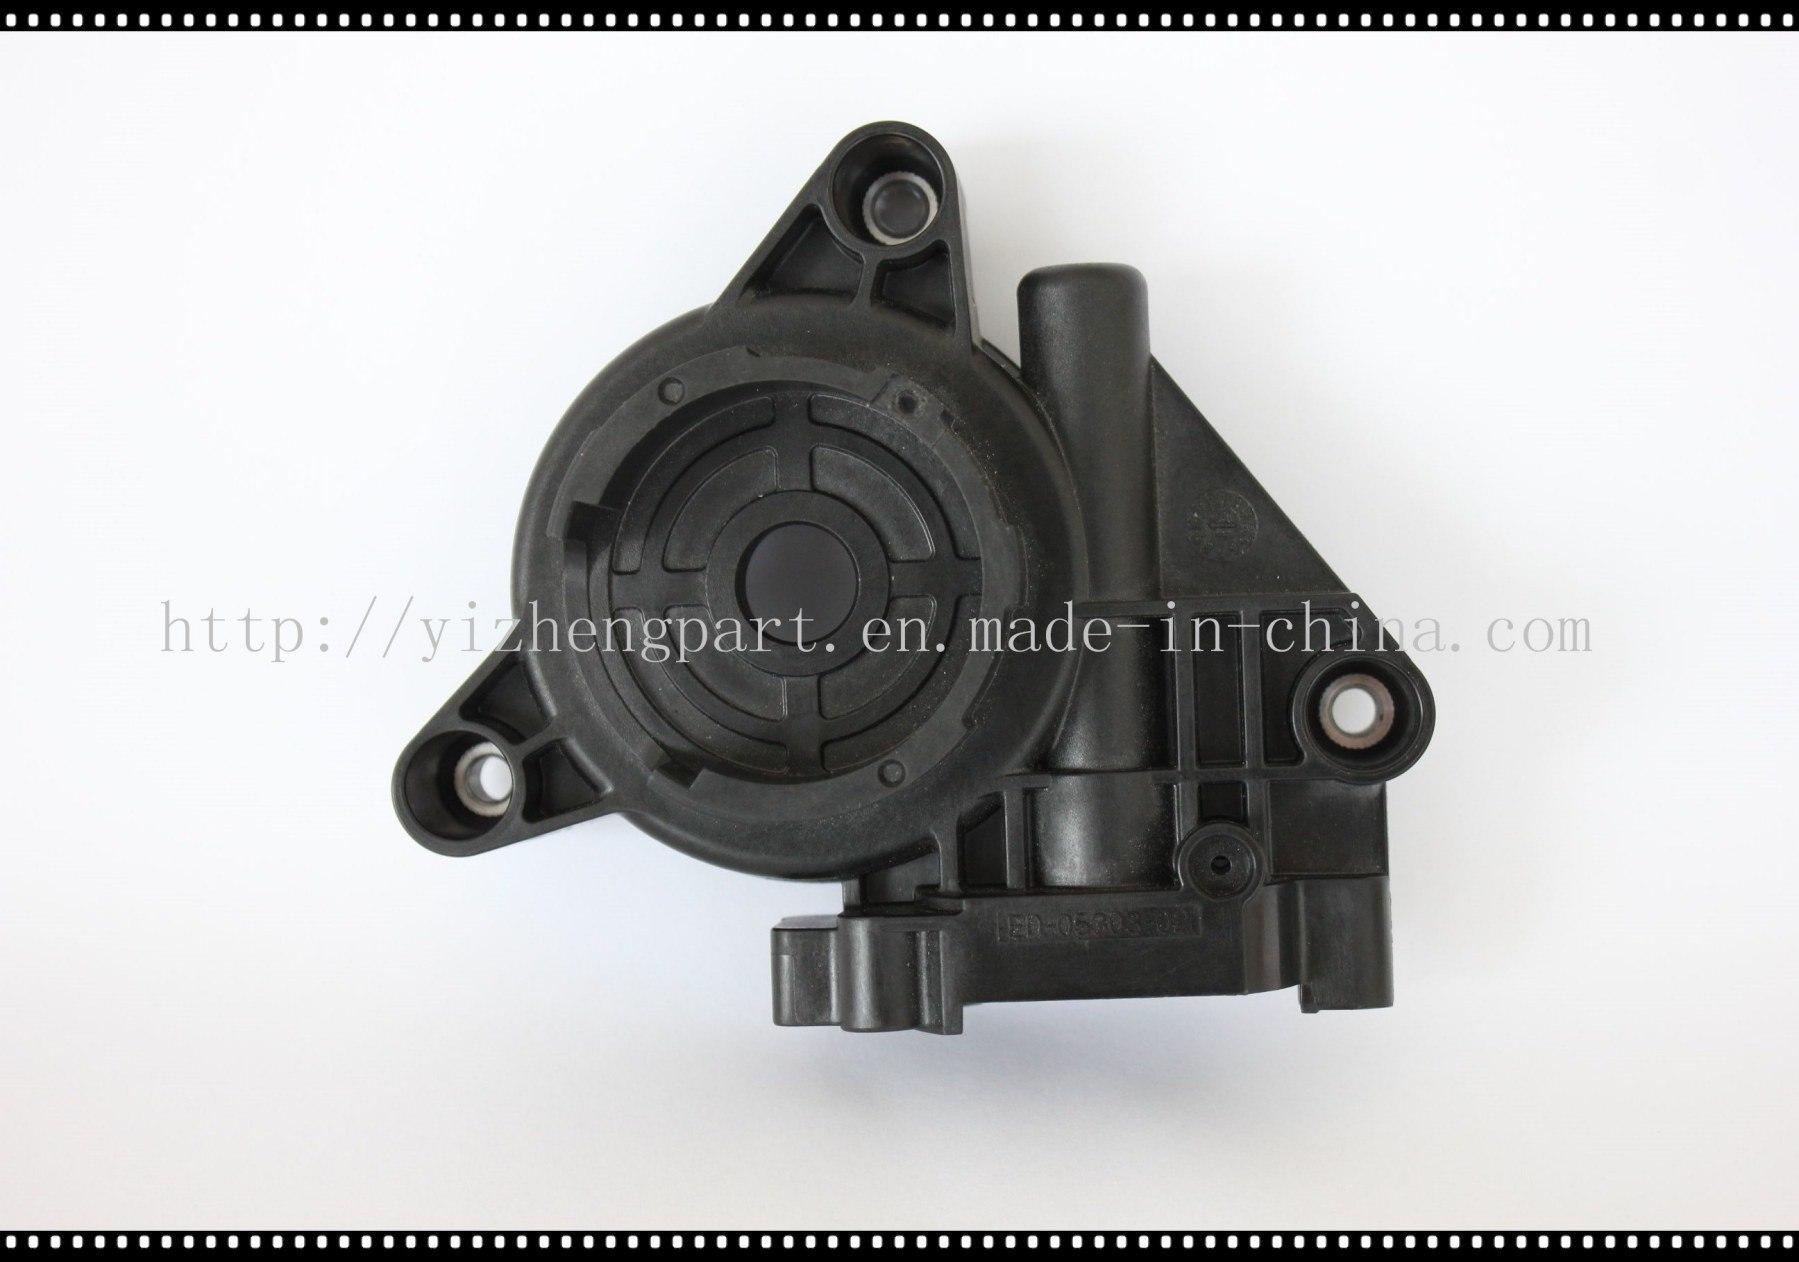 Automotive Mold Parts plastic Injection Mold of Automotive